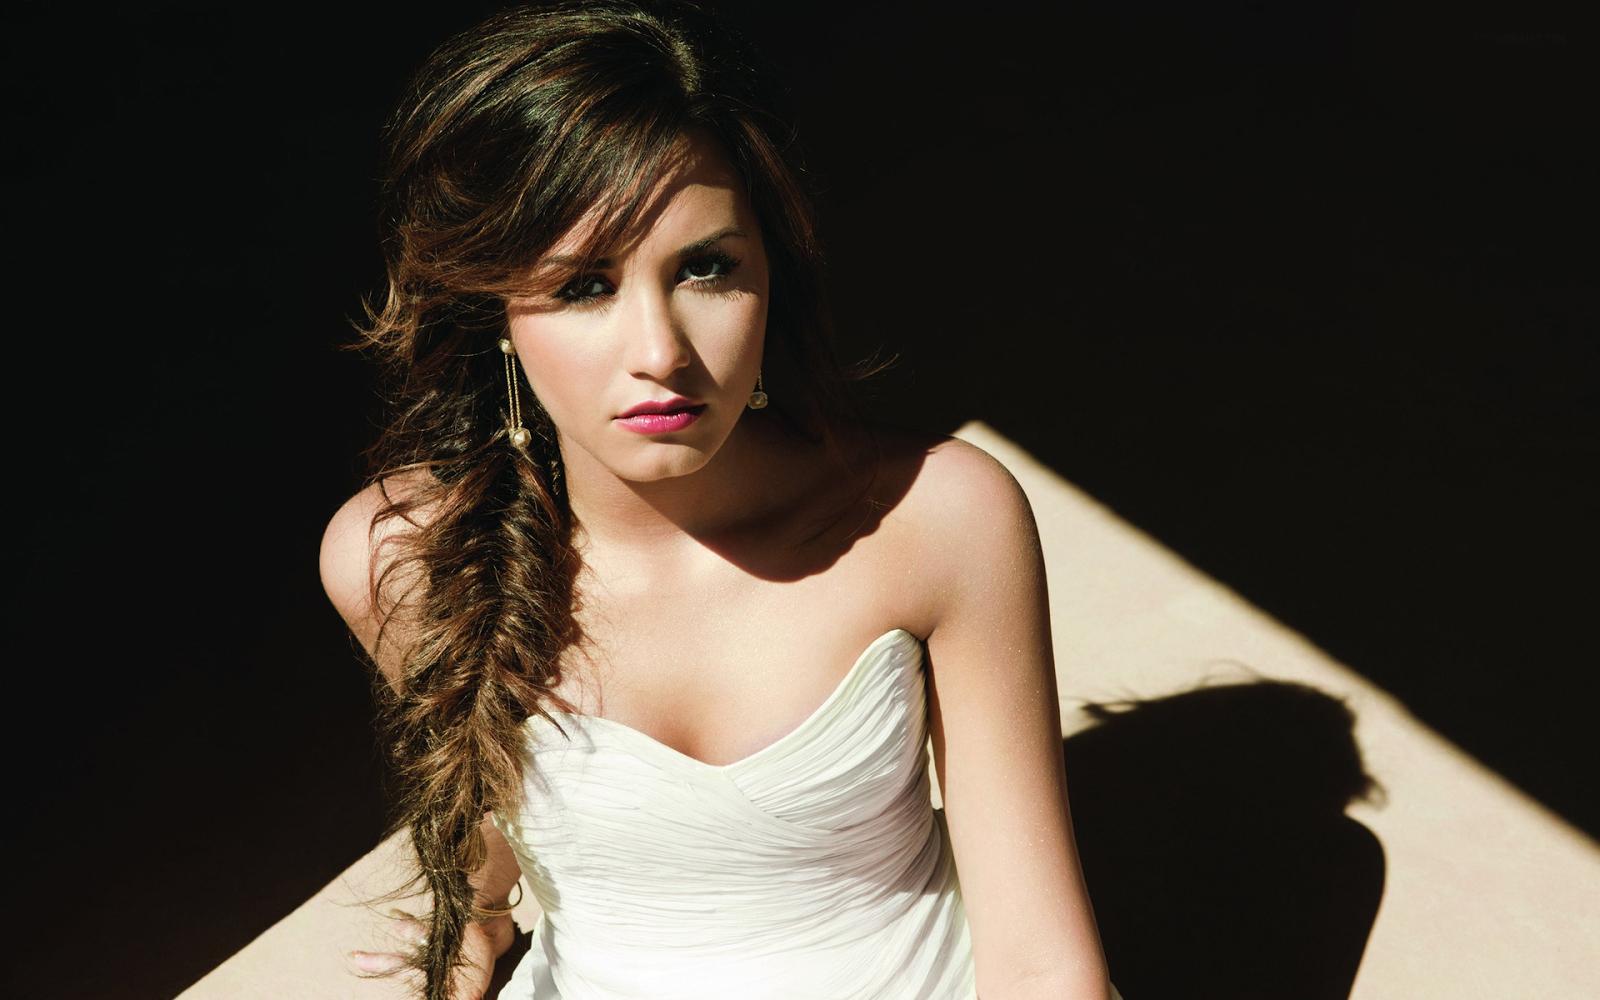 Demi Lovato 2015 Wallpaper HiresMOVIEWALLcom 1600x1000